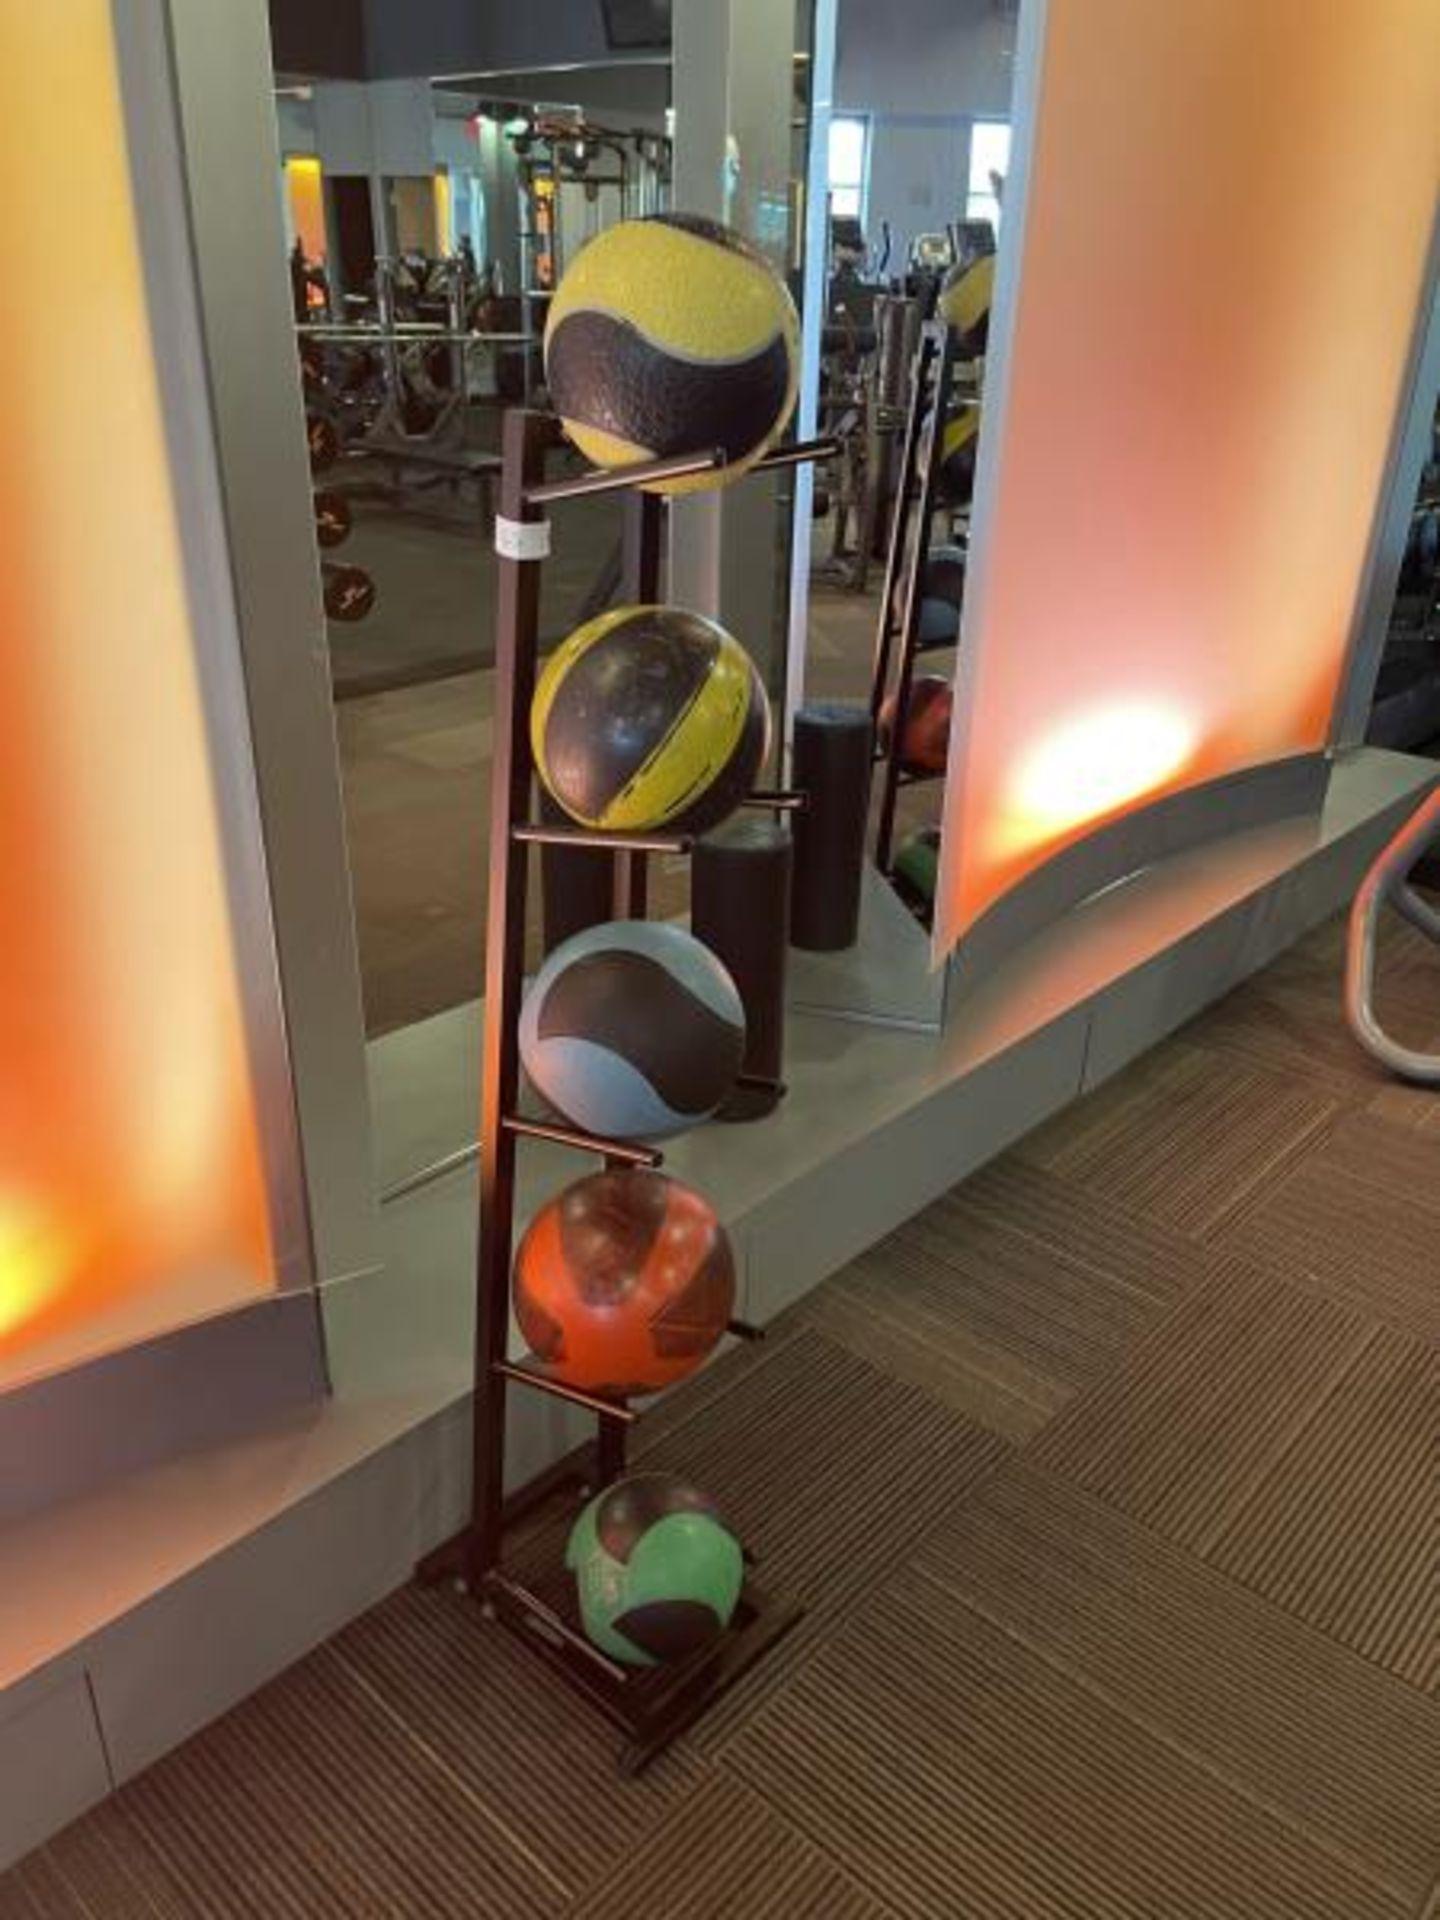 Medicine Training Balls with 5 Tier Metal Rack